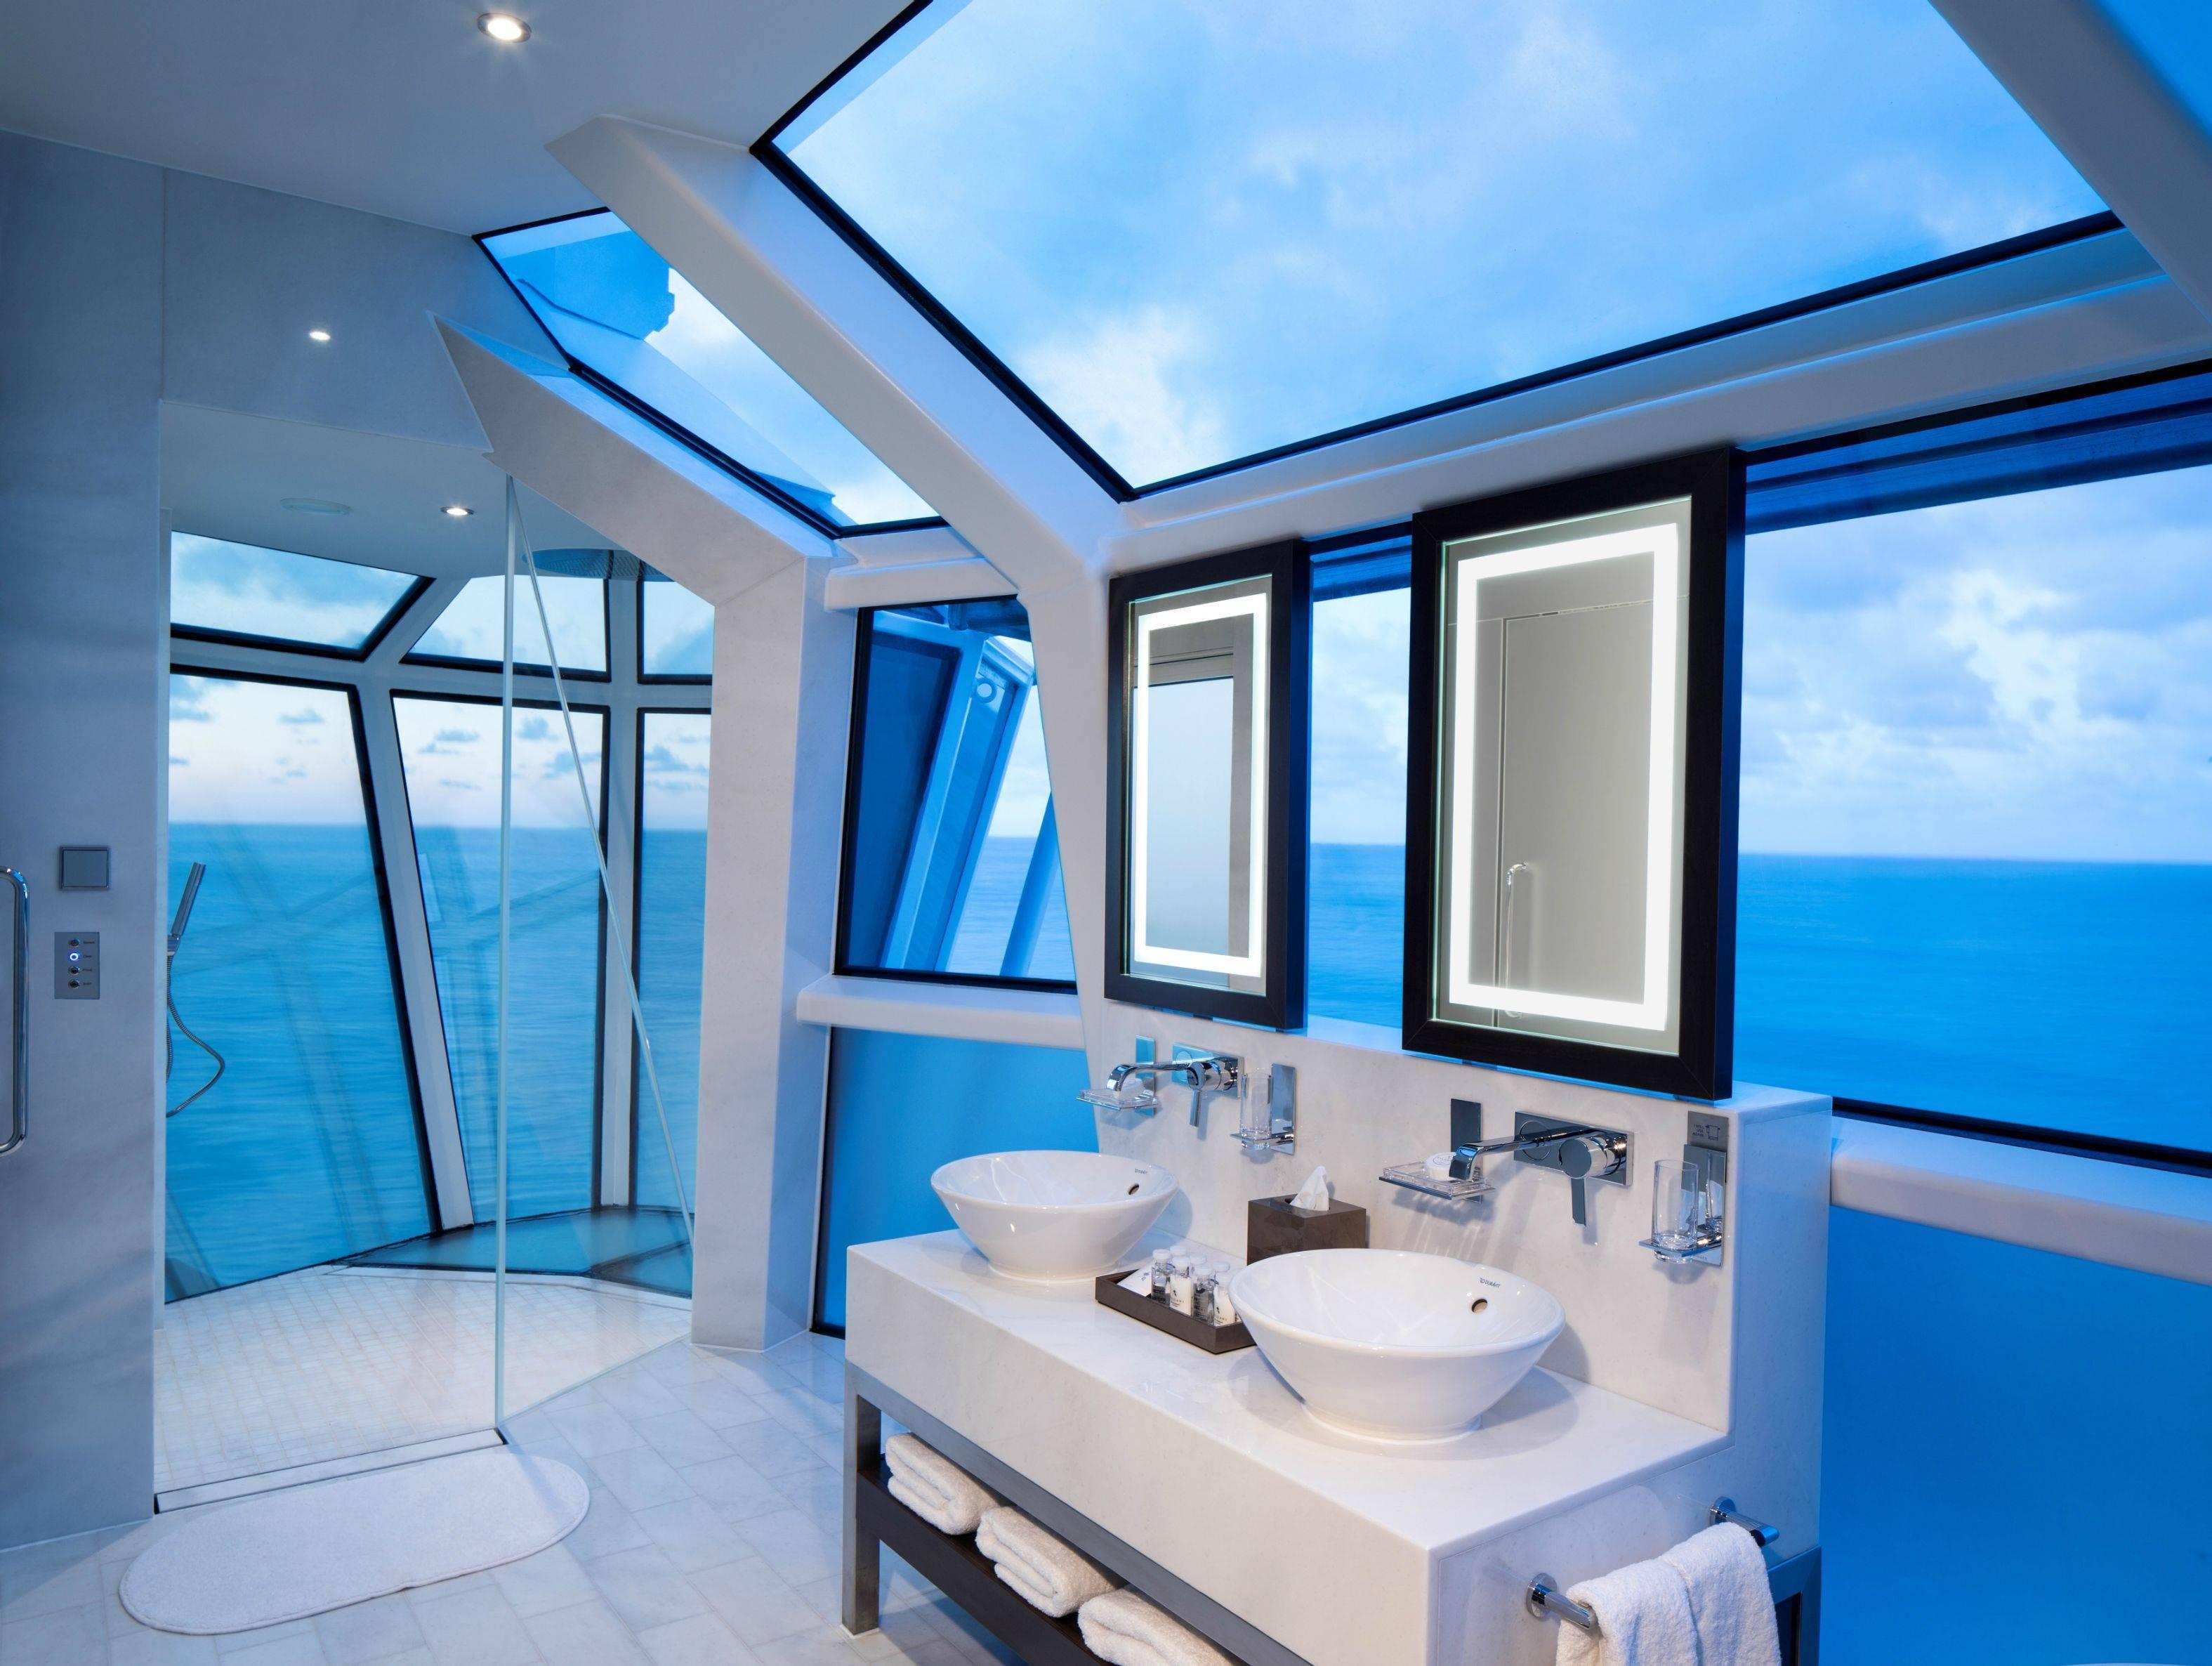 Yarrme Bathroom Pron - Bathroom pron